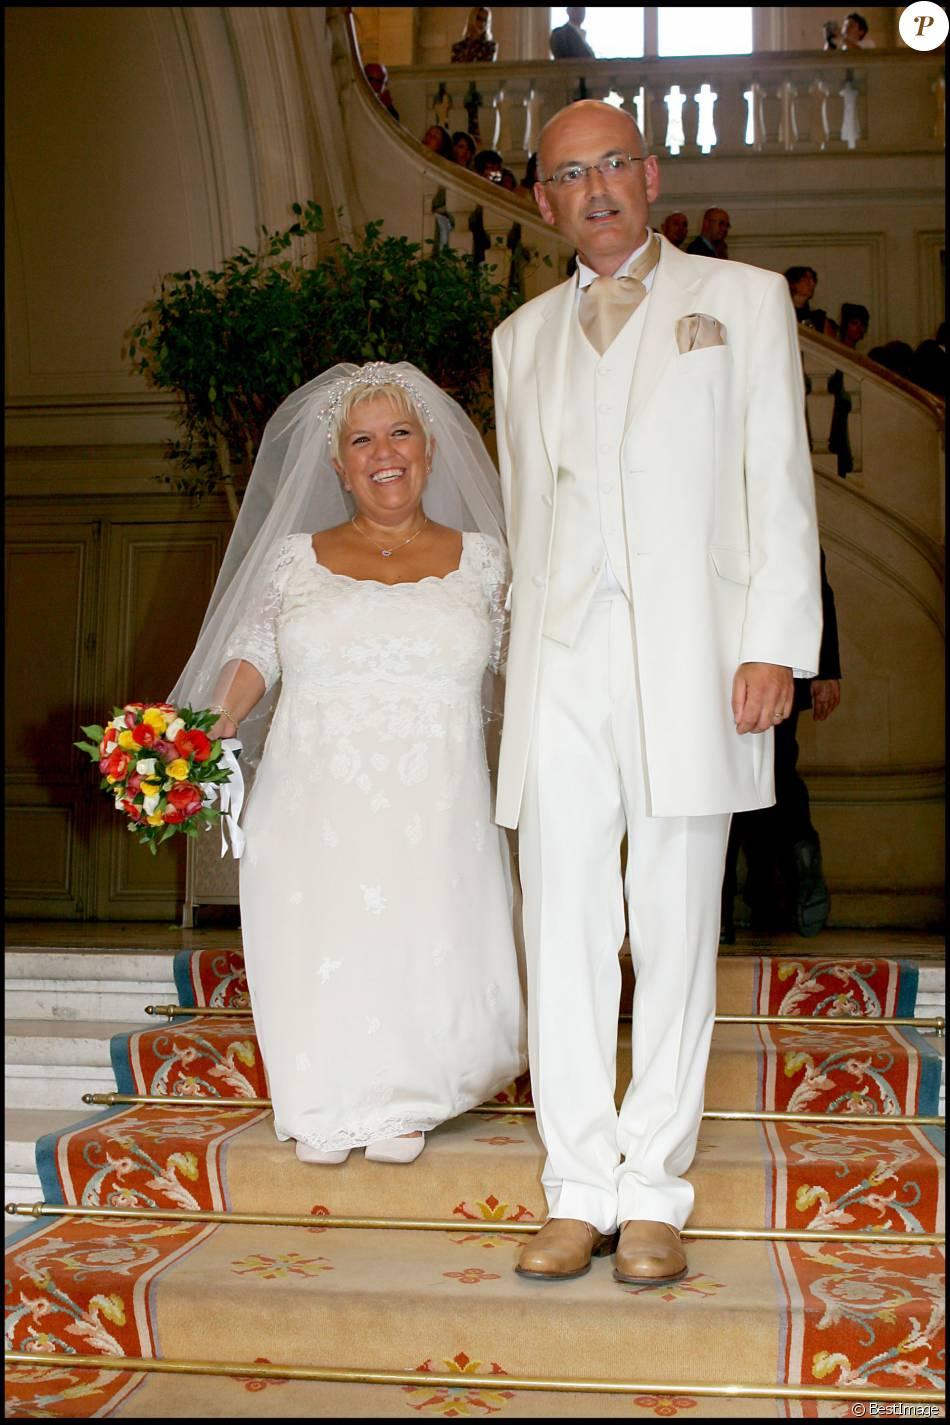 mariage de mimie mathy et benoist gerard la mairie de neuilly en 2005 purepeople. Black Bedroom Furniture Sets. Home Design Ideas